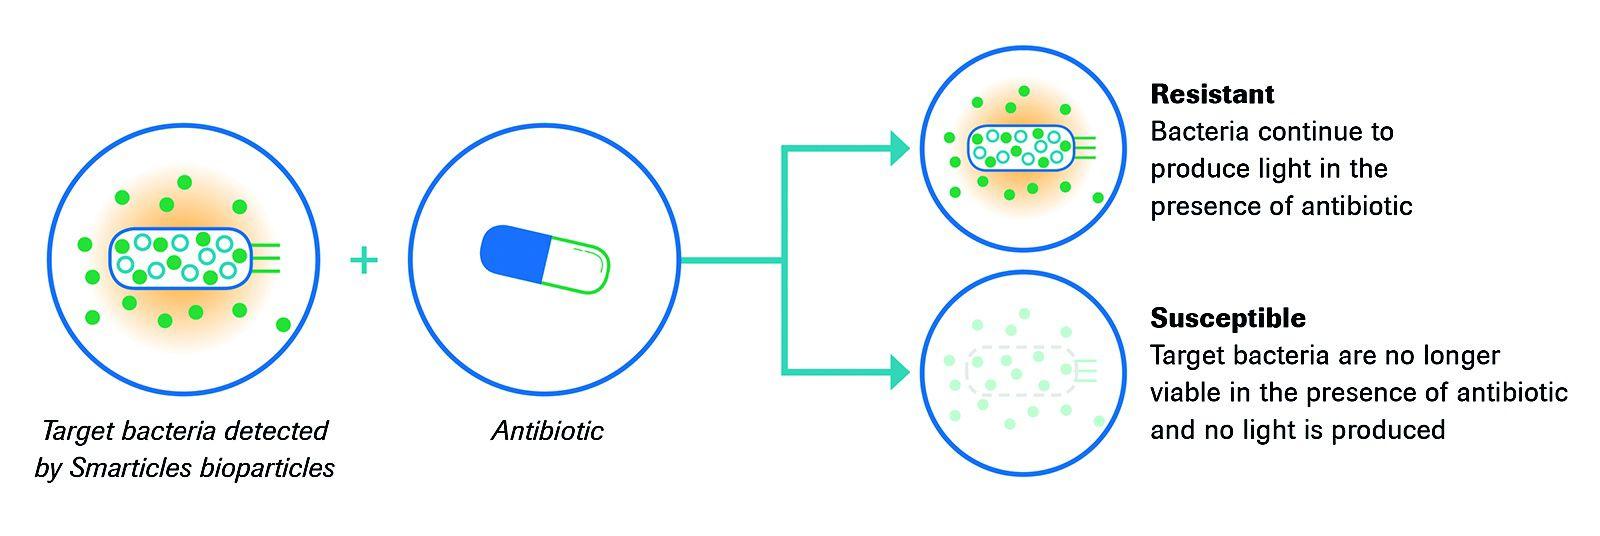 phenotypic-detection-of-drug-resistance